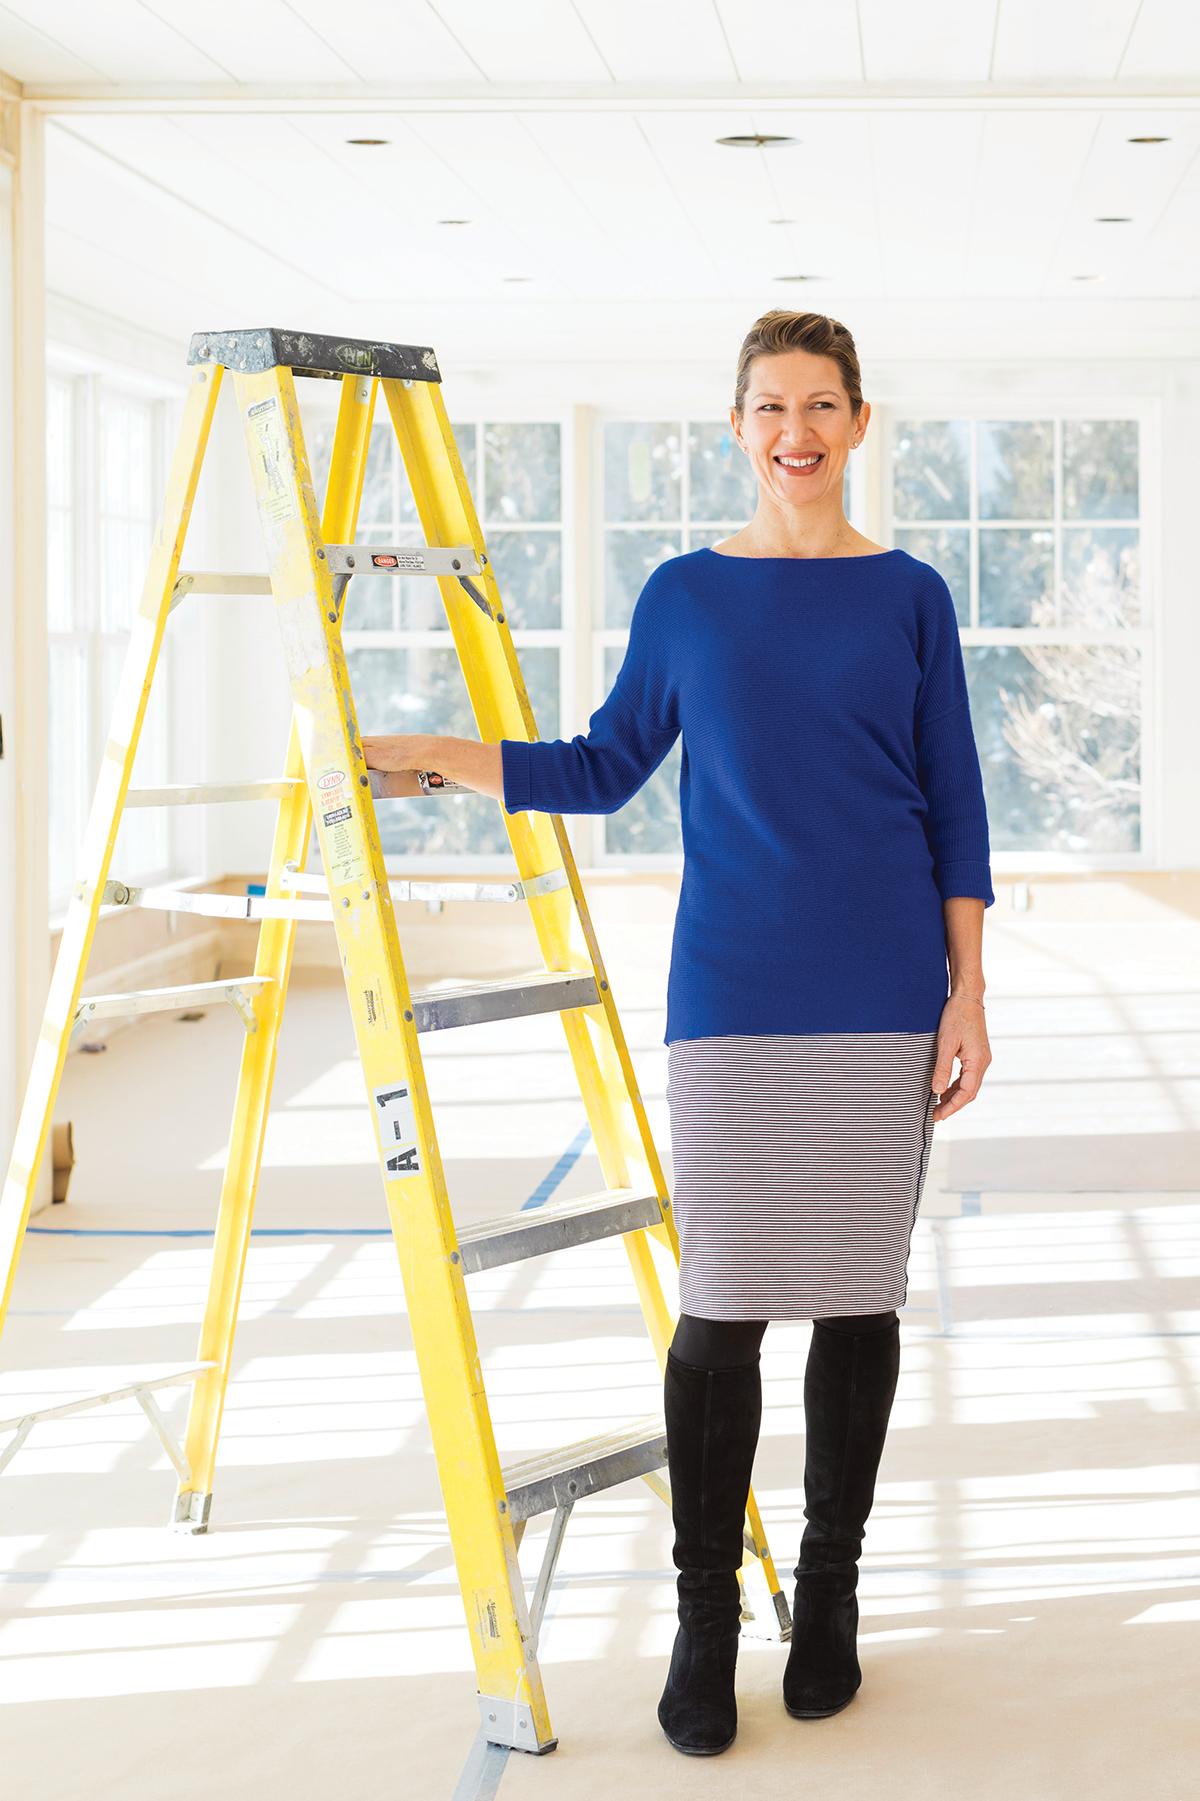 sarah lawson owner s+h construction boston